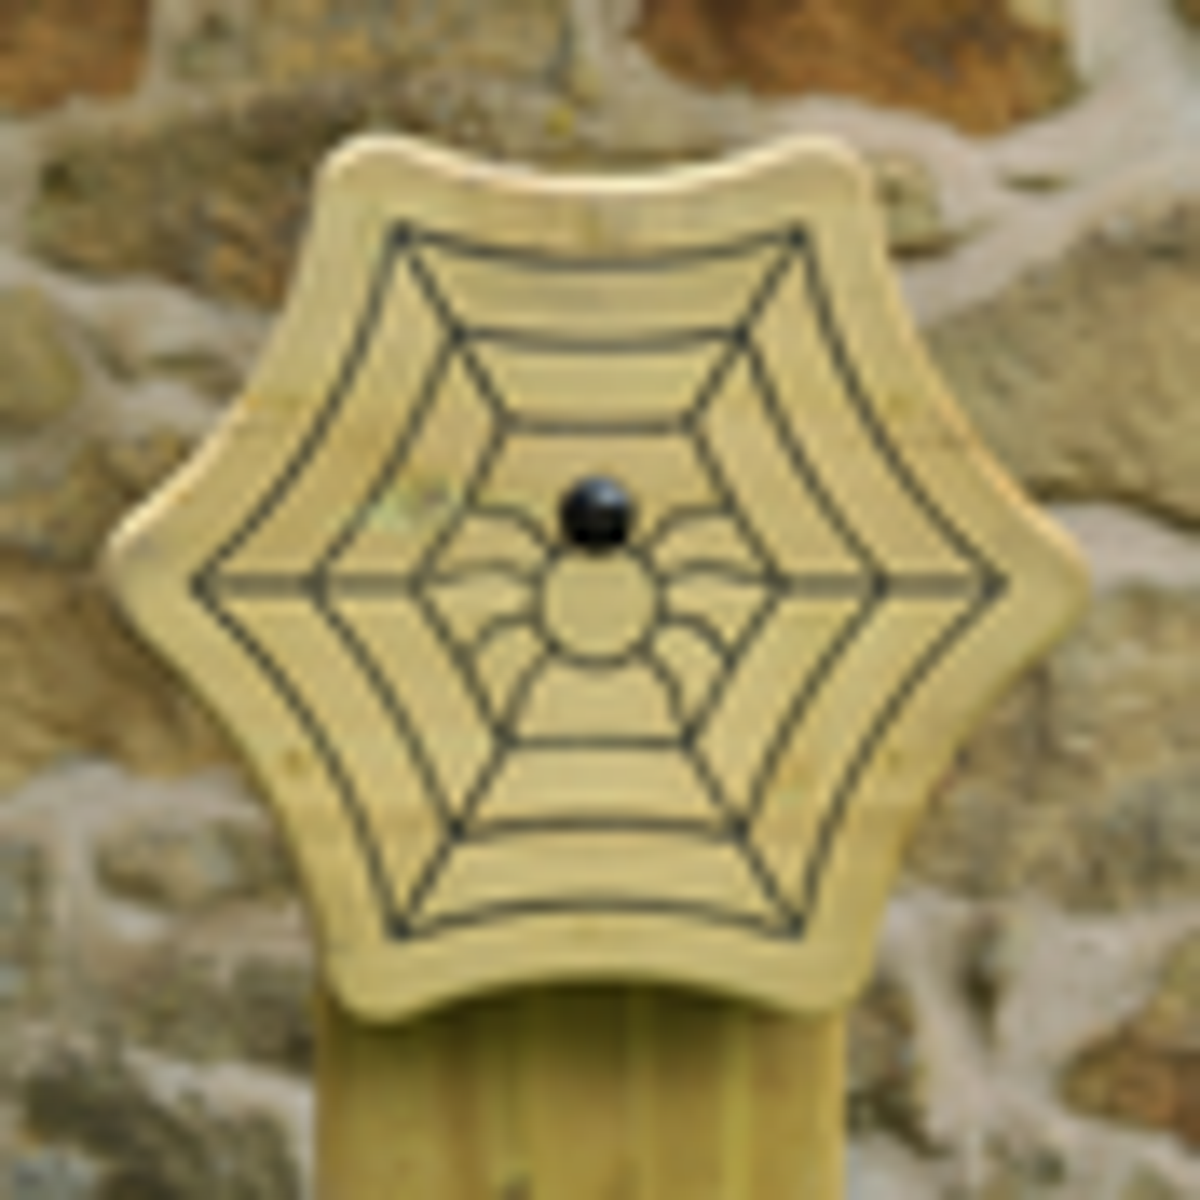 Spider Animal Face Totem